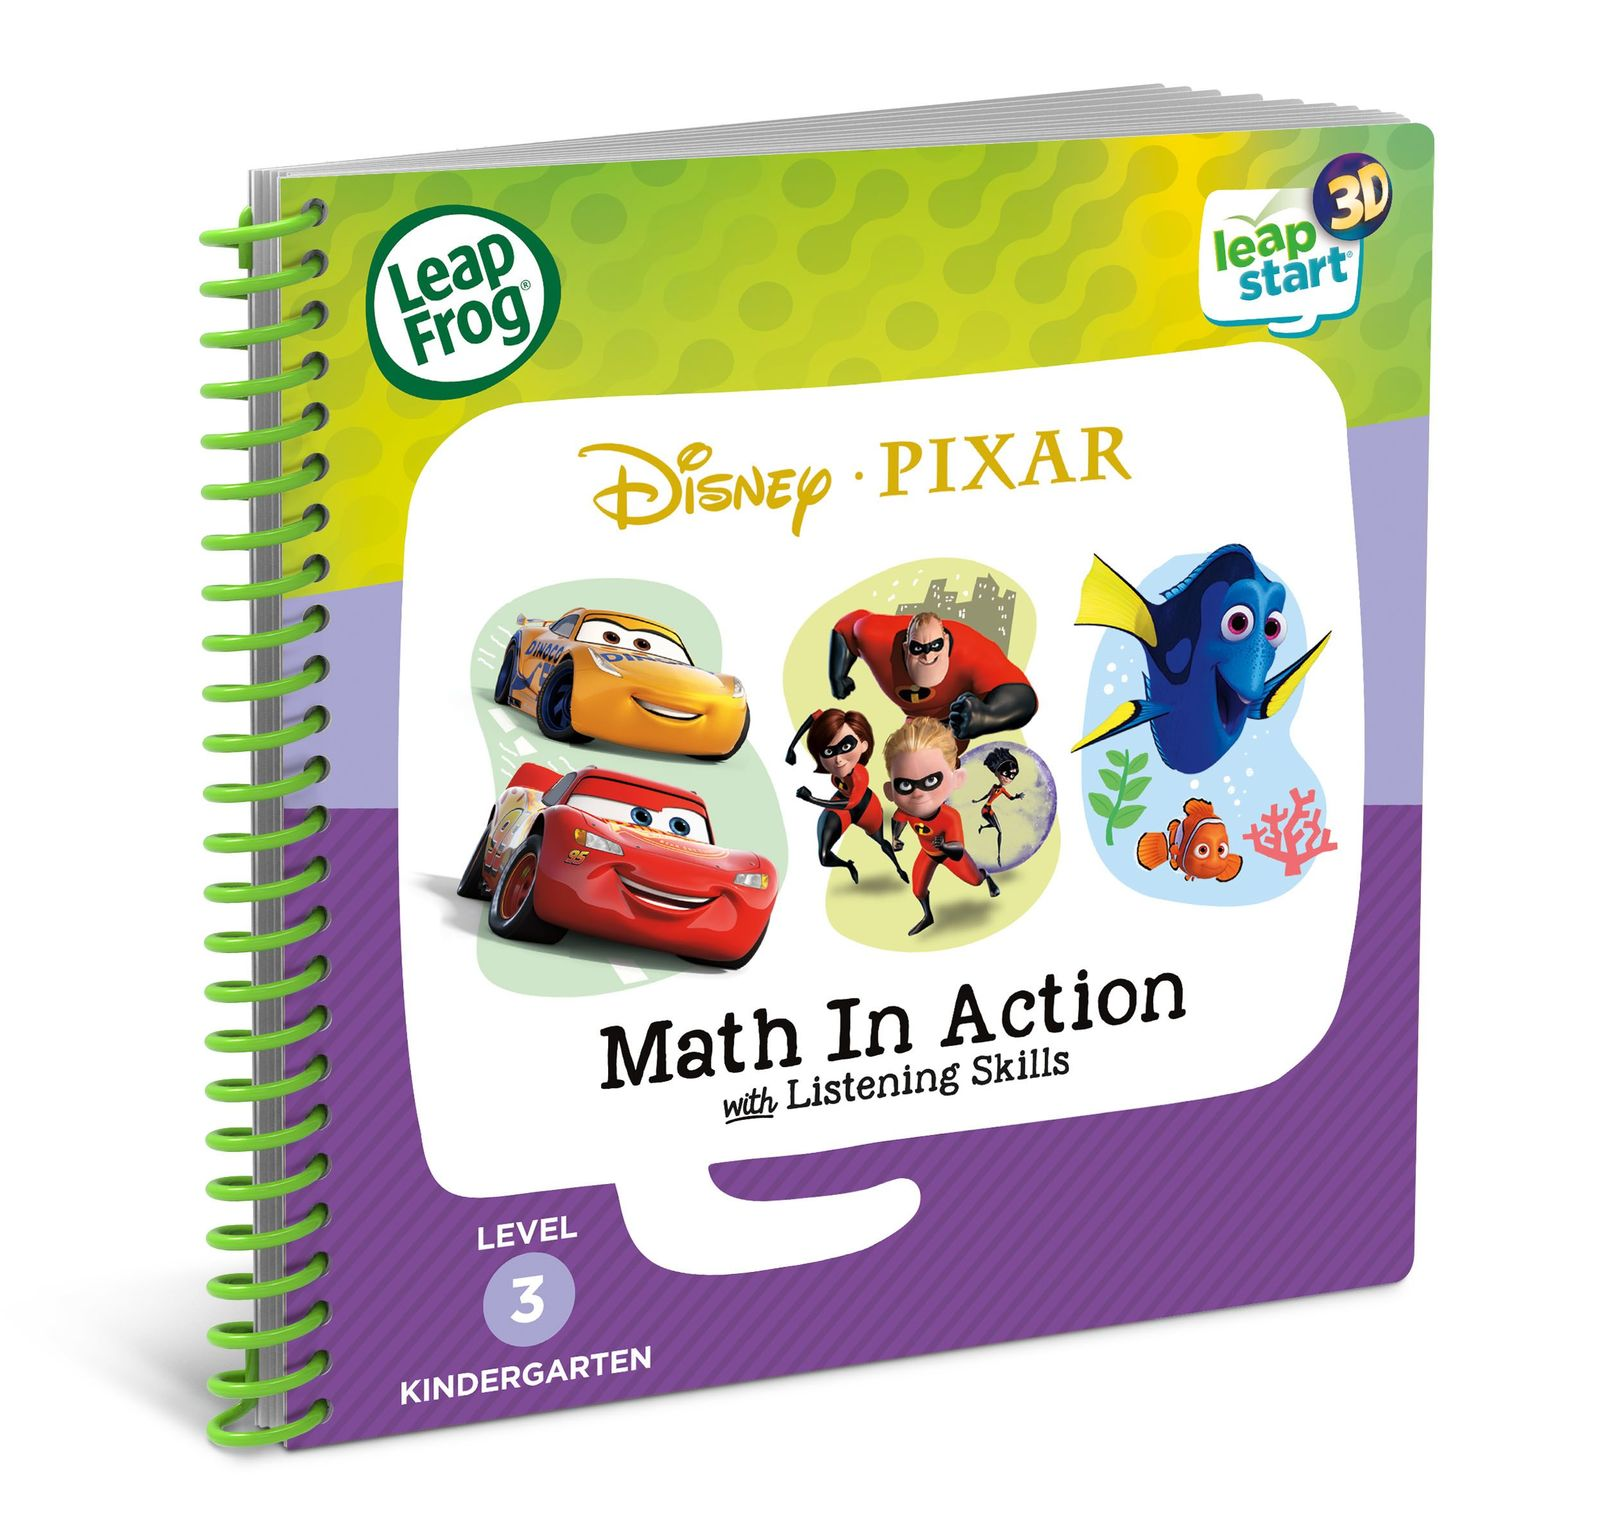 Leapstart 3D: Disney Pixar - Math In Action With Listening Skills (Level 3) image